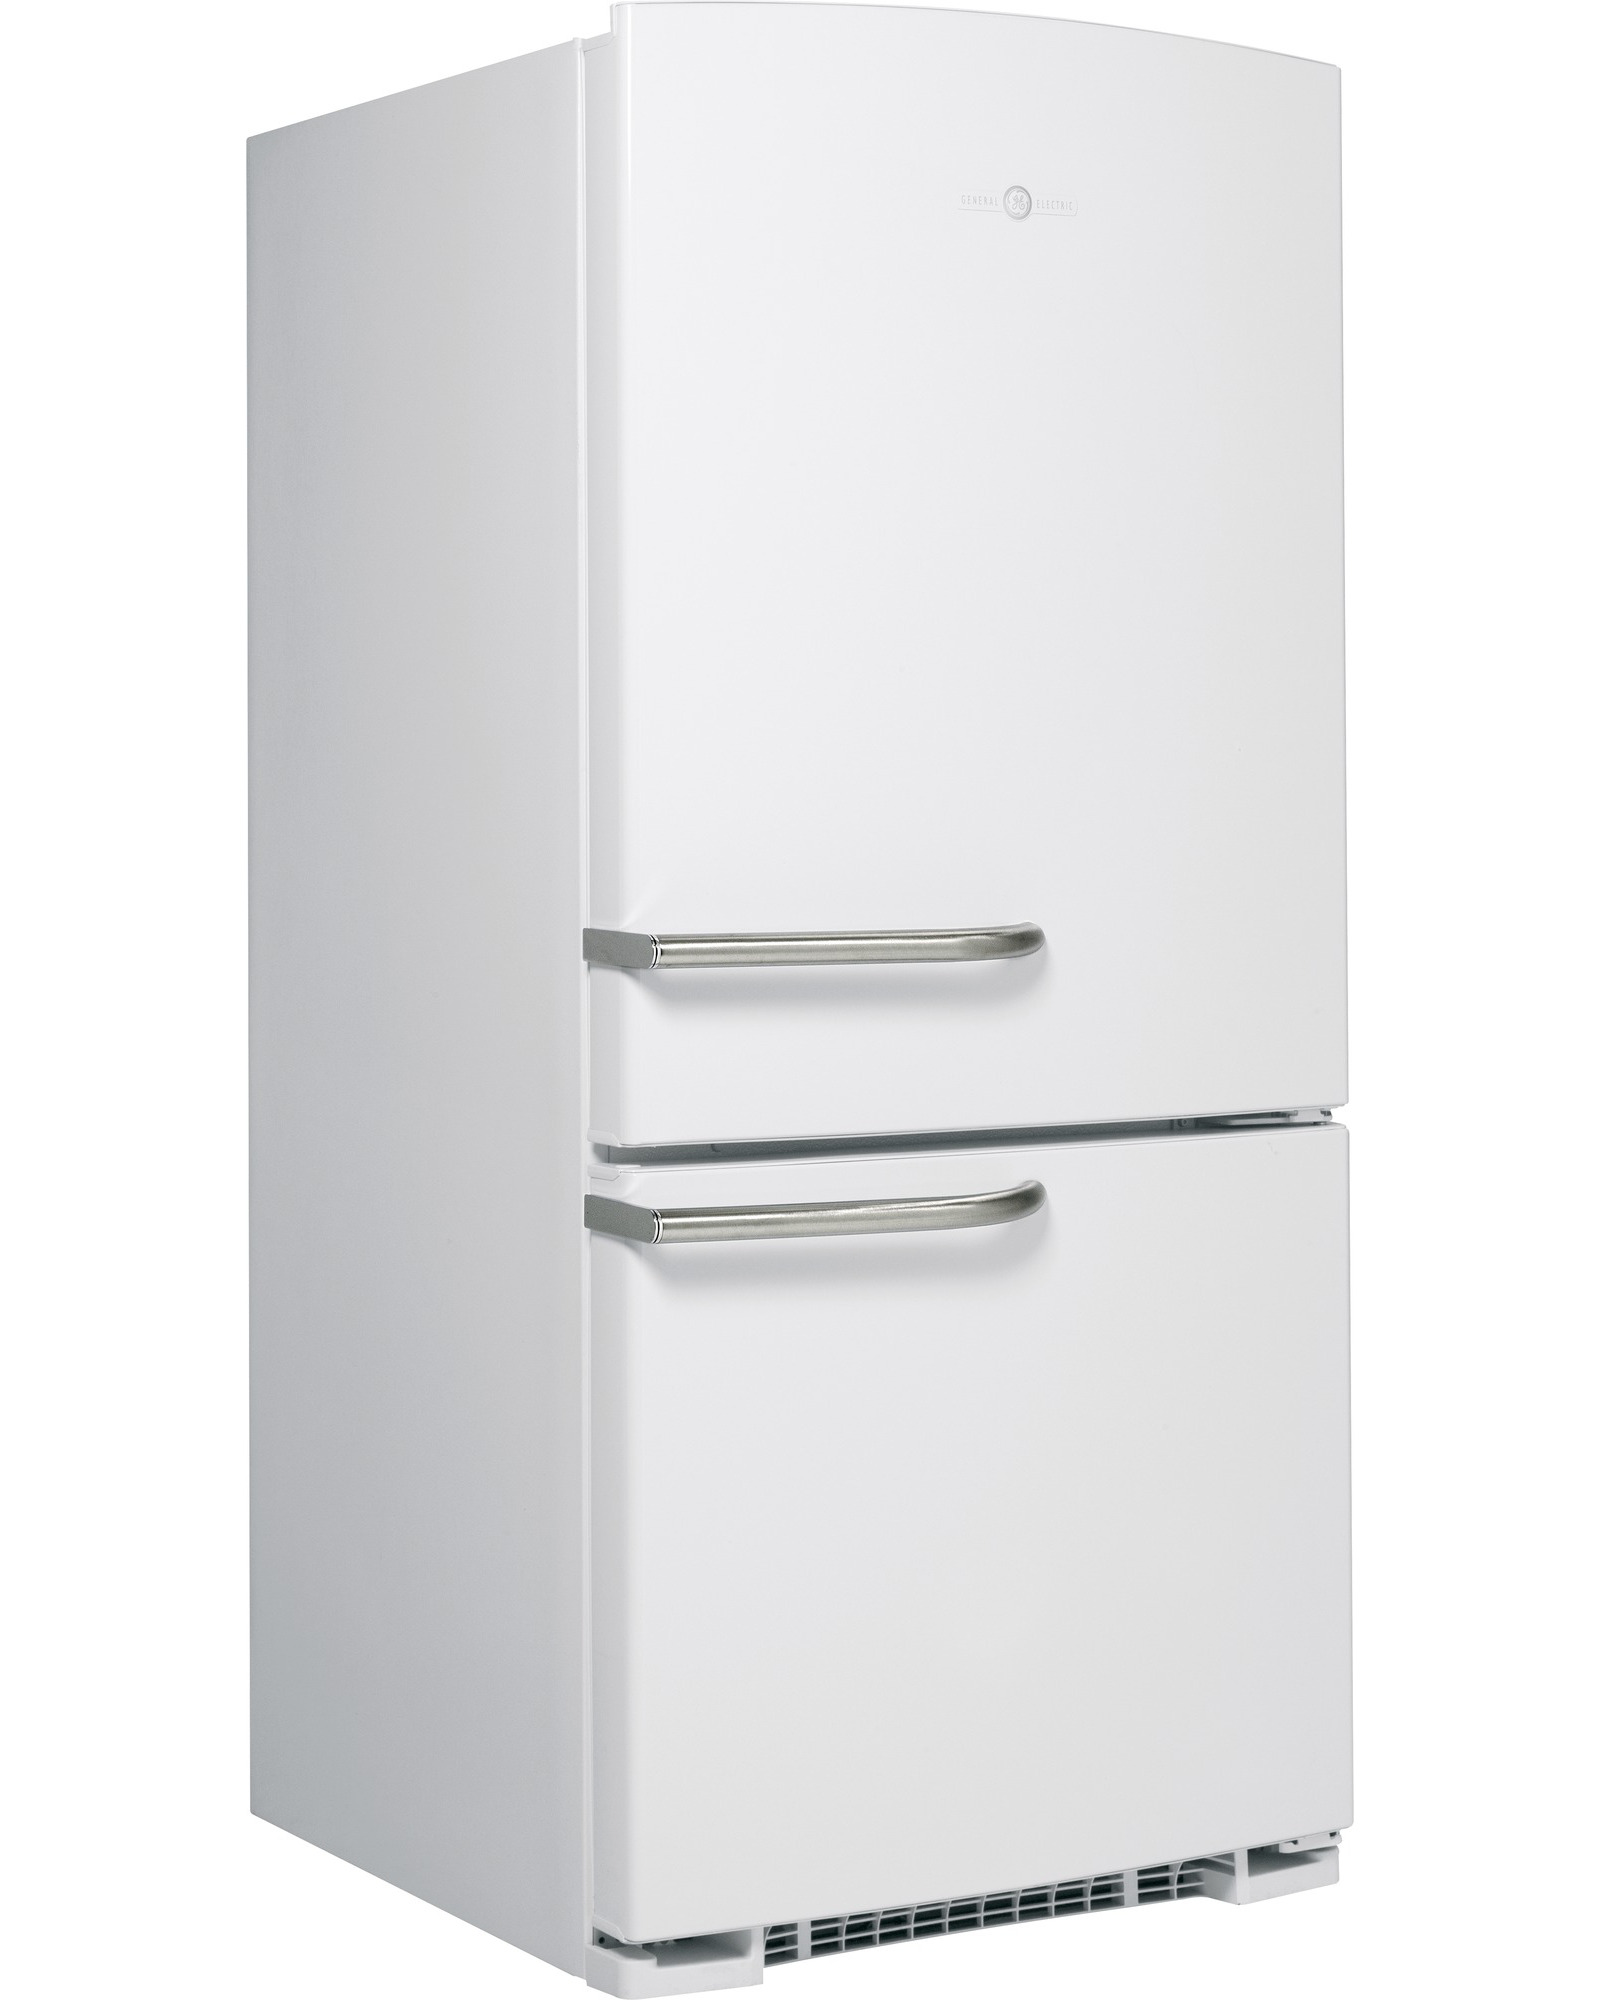 GE Appliances ABE20EGHWS 20.3 cu. ft. Bottom-Freezer Refrigerator - White